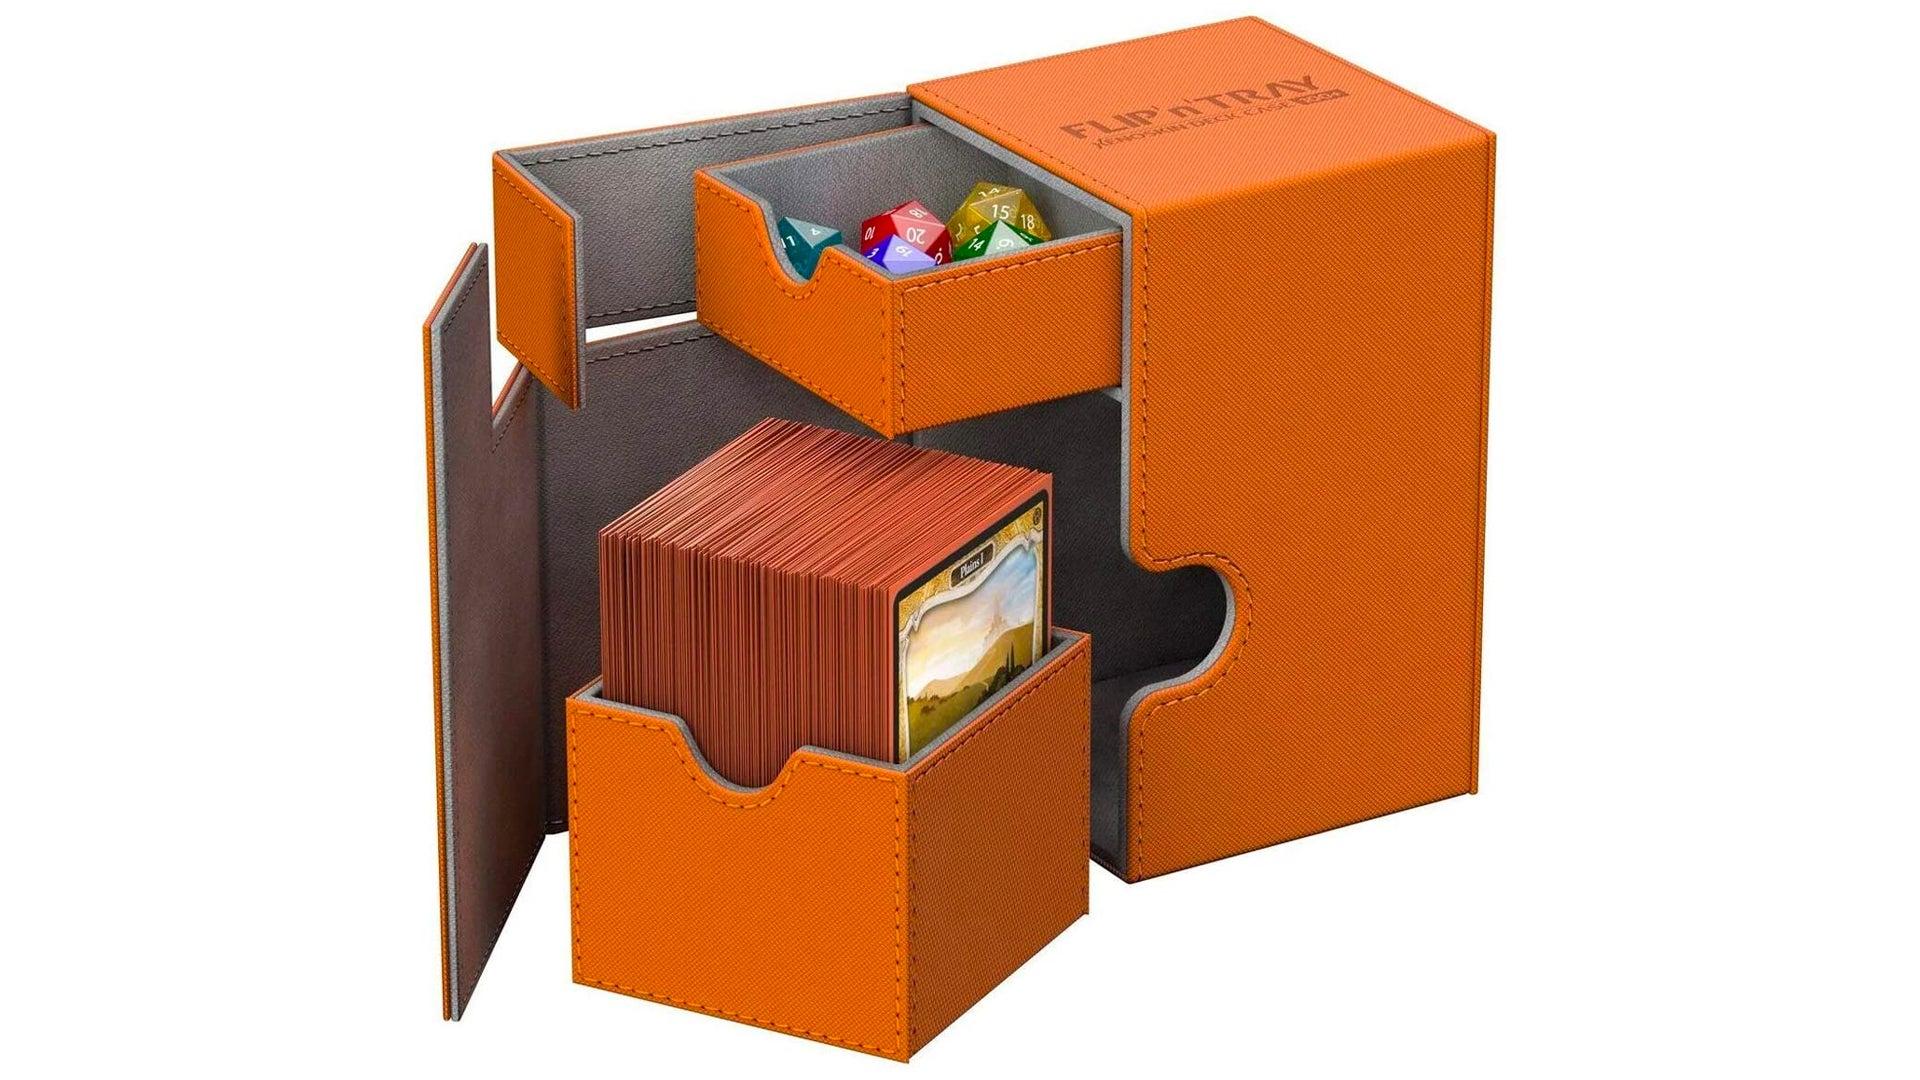 ultimate-guard-flip-n-tray-xenoskin-deck-box.jpg